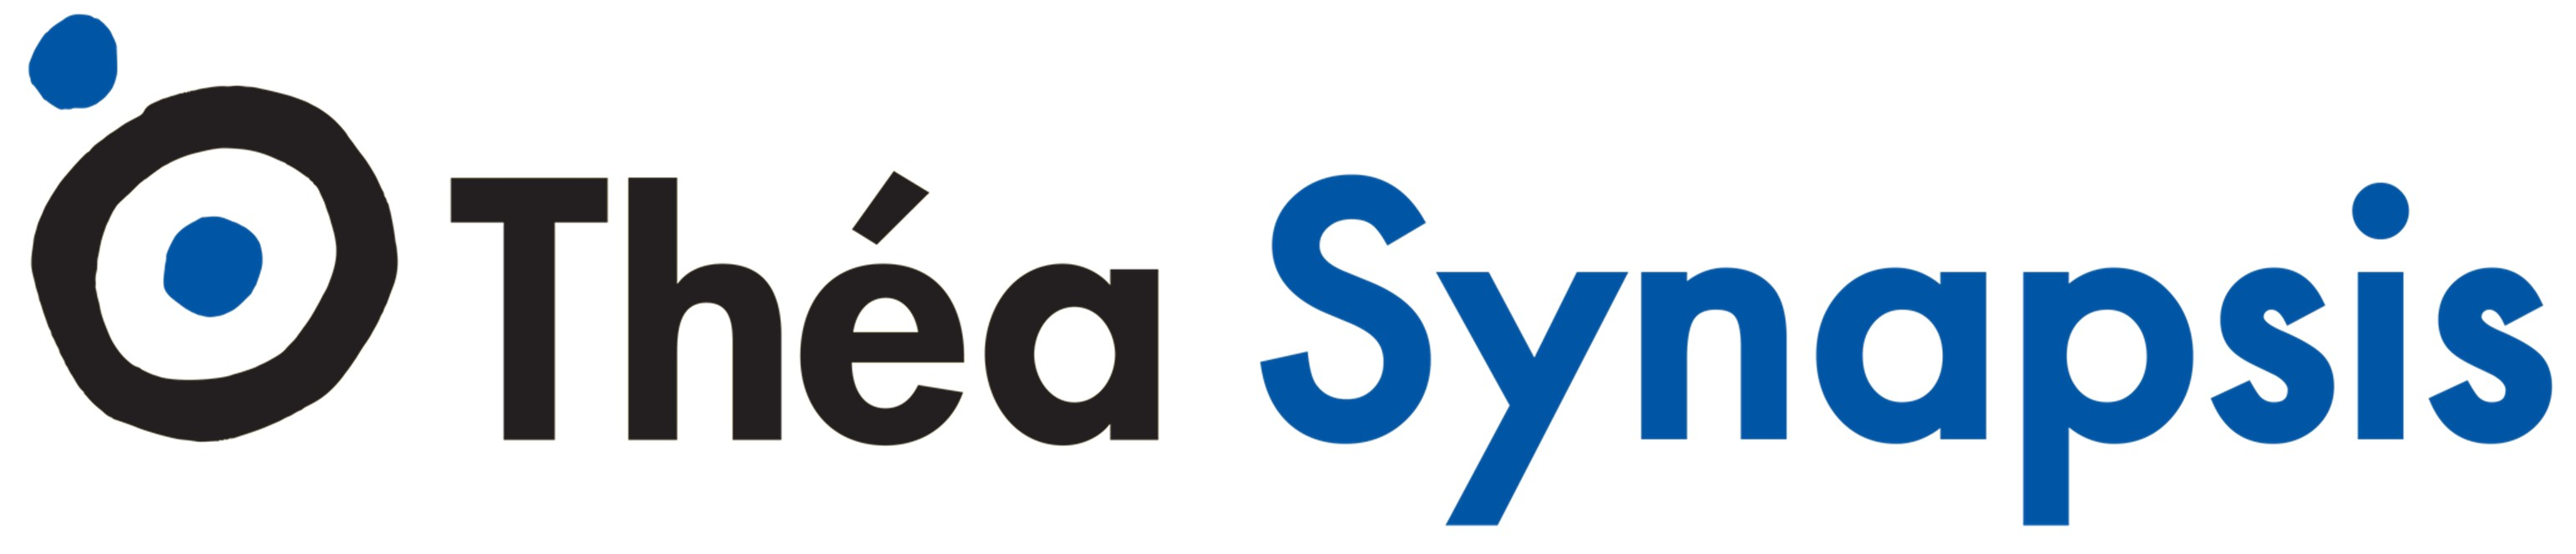 Théa Synapsis